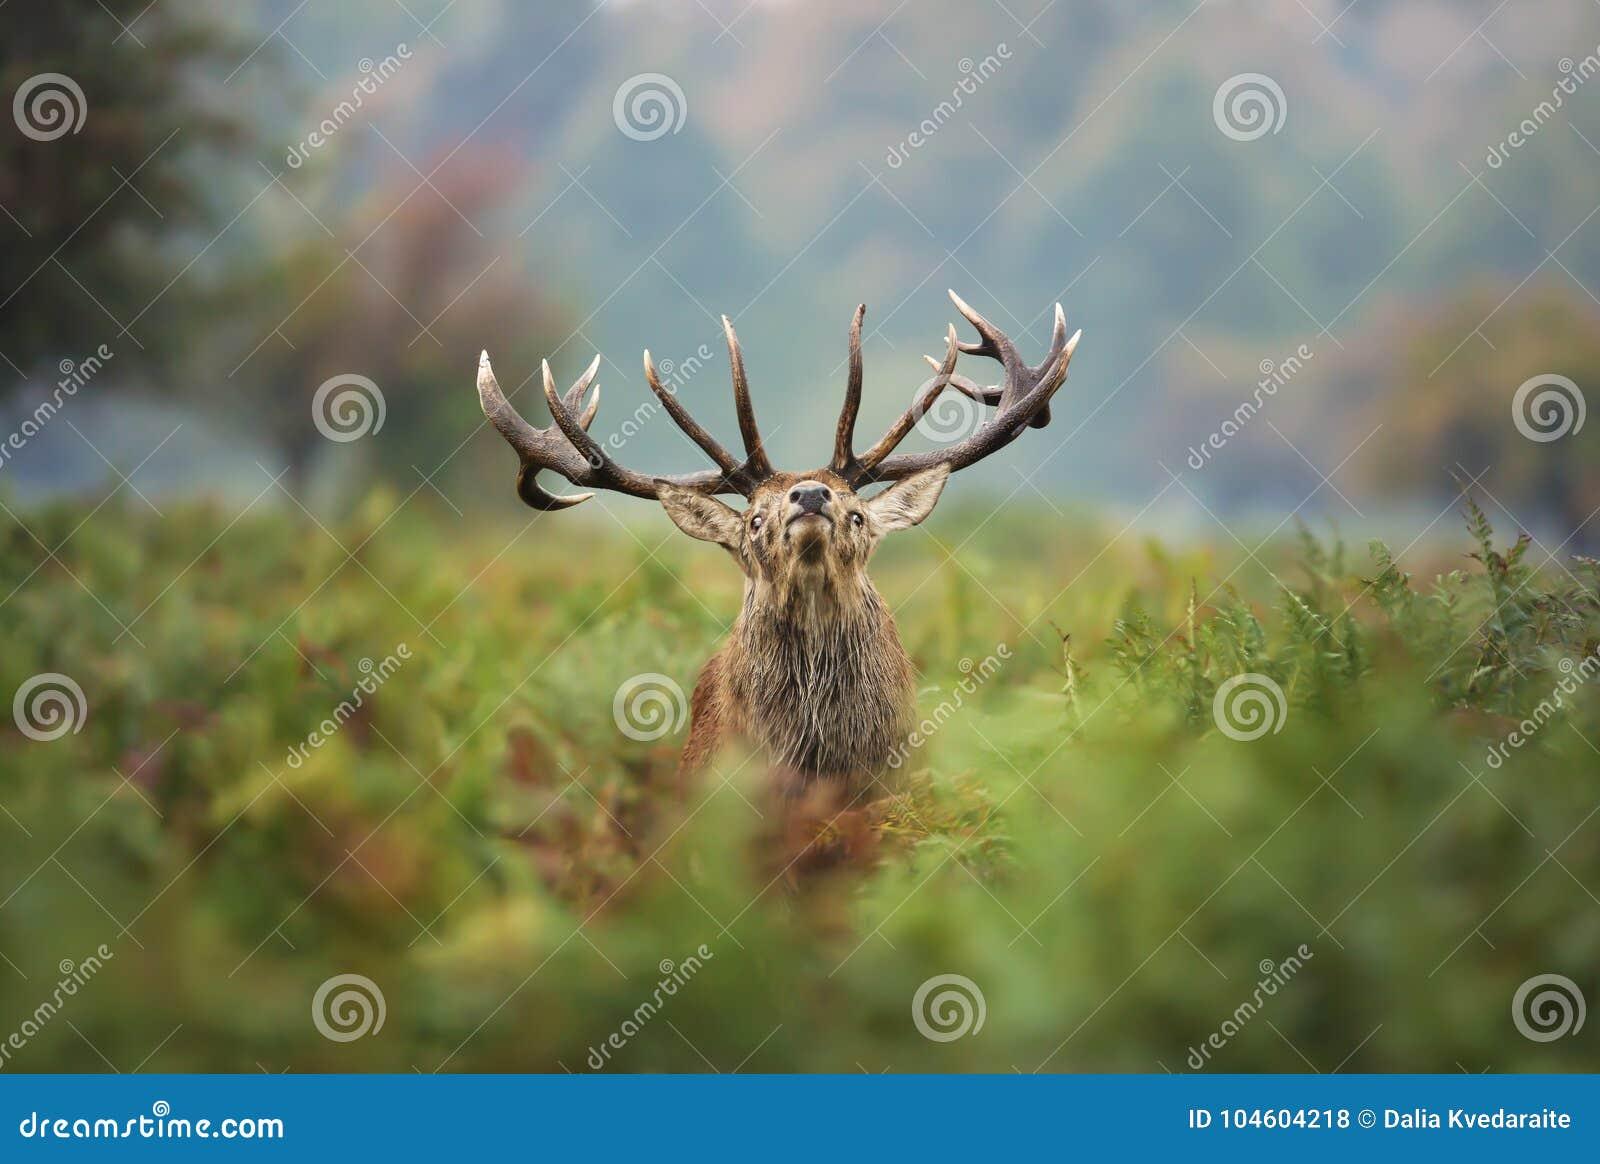 Rood hertenmannetje tijdens de sleur